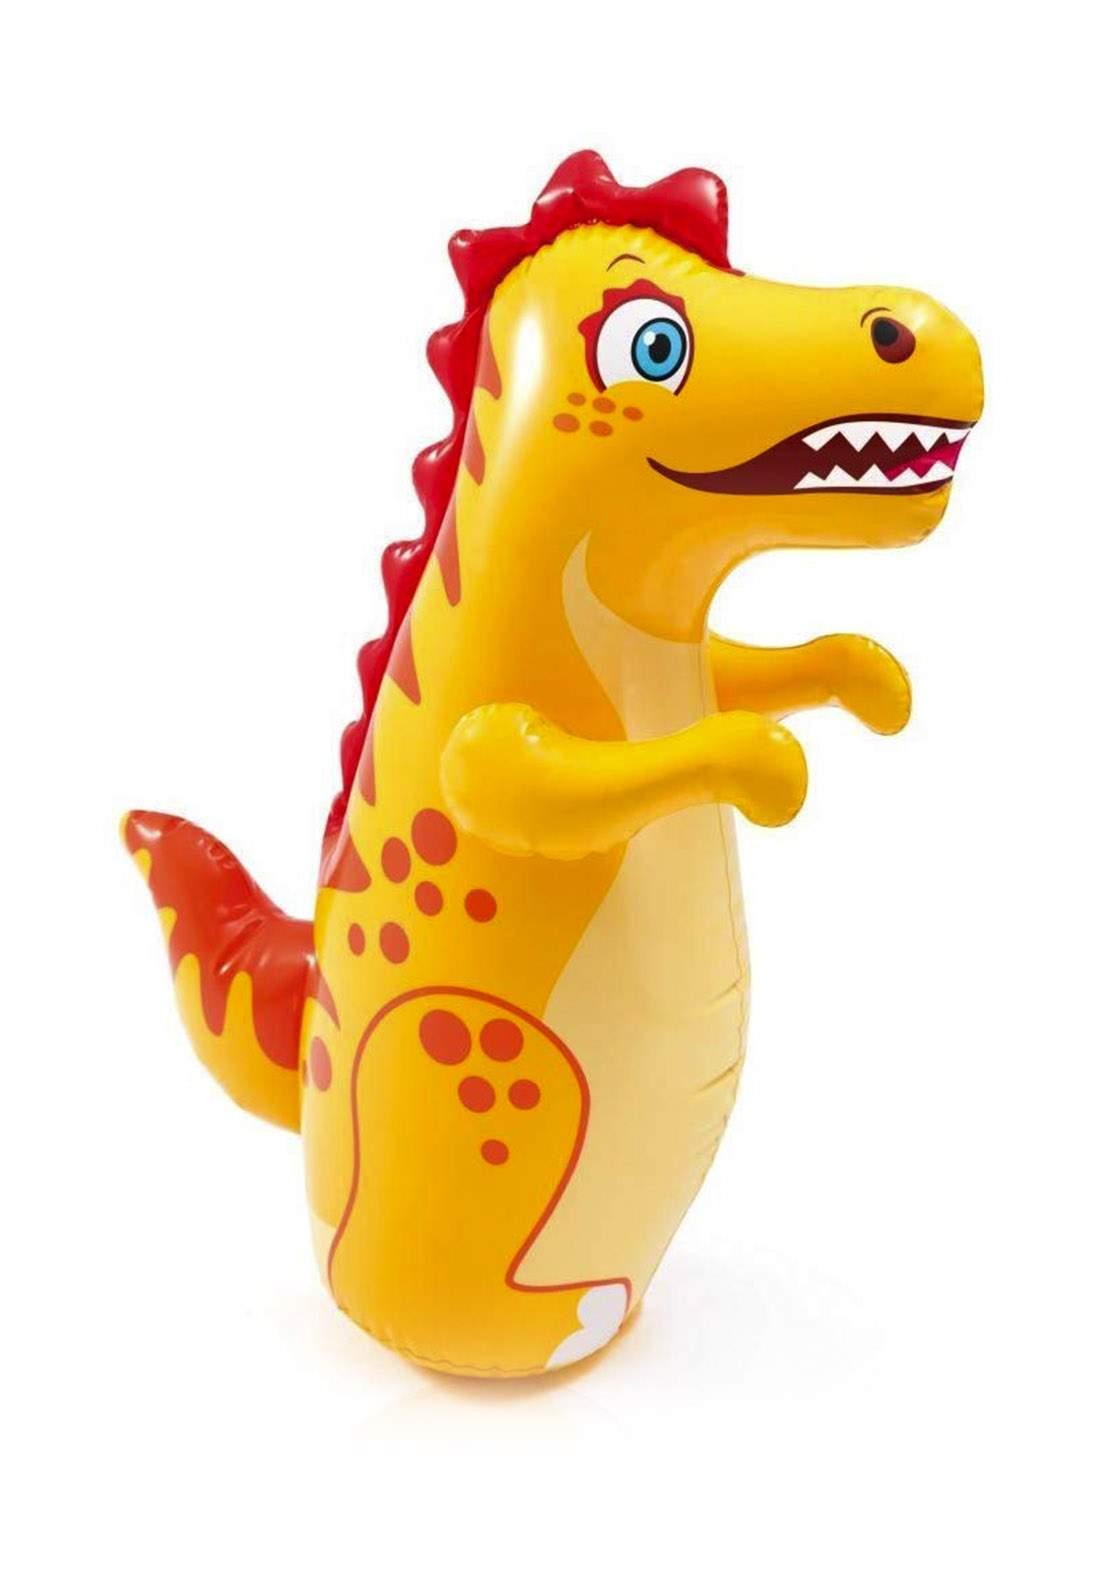 Intex  Crocodile Punching Play Toy For Kids  كيس ملاكمة للأطفال